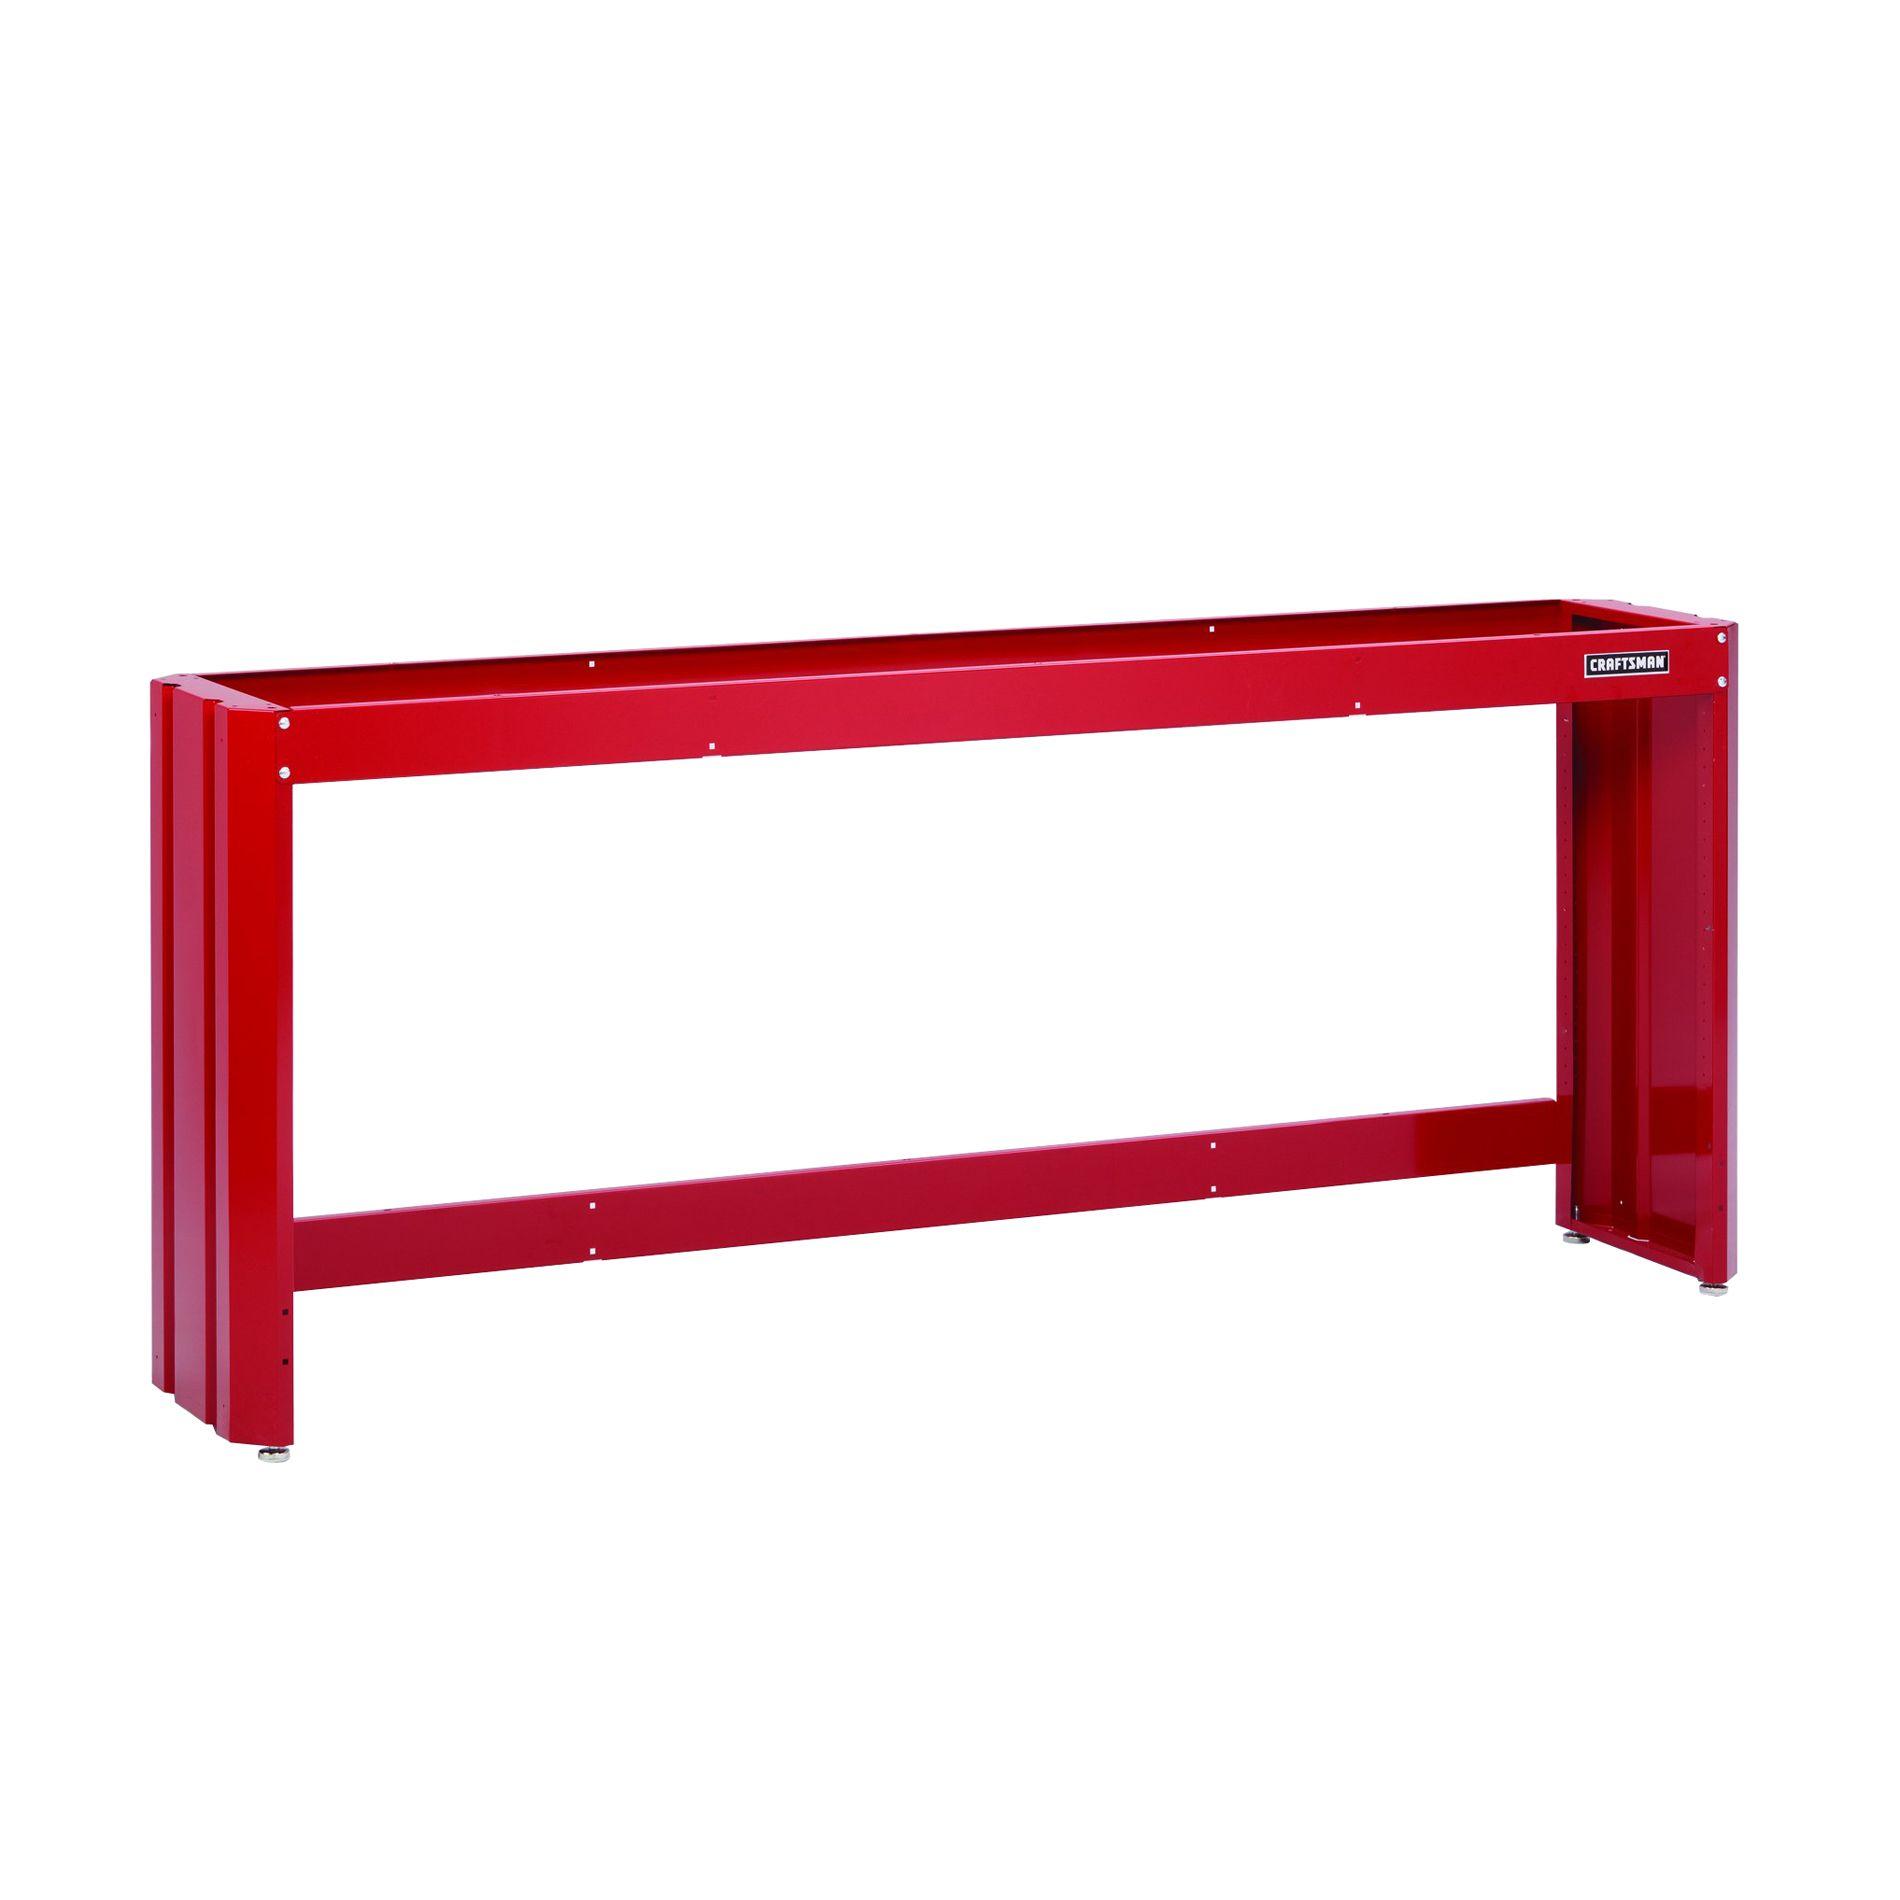 Craftsman 8' Workbench Frame - Red